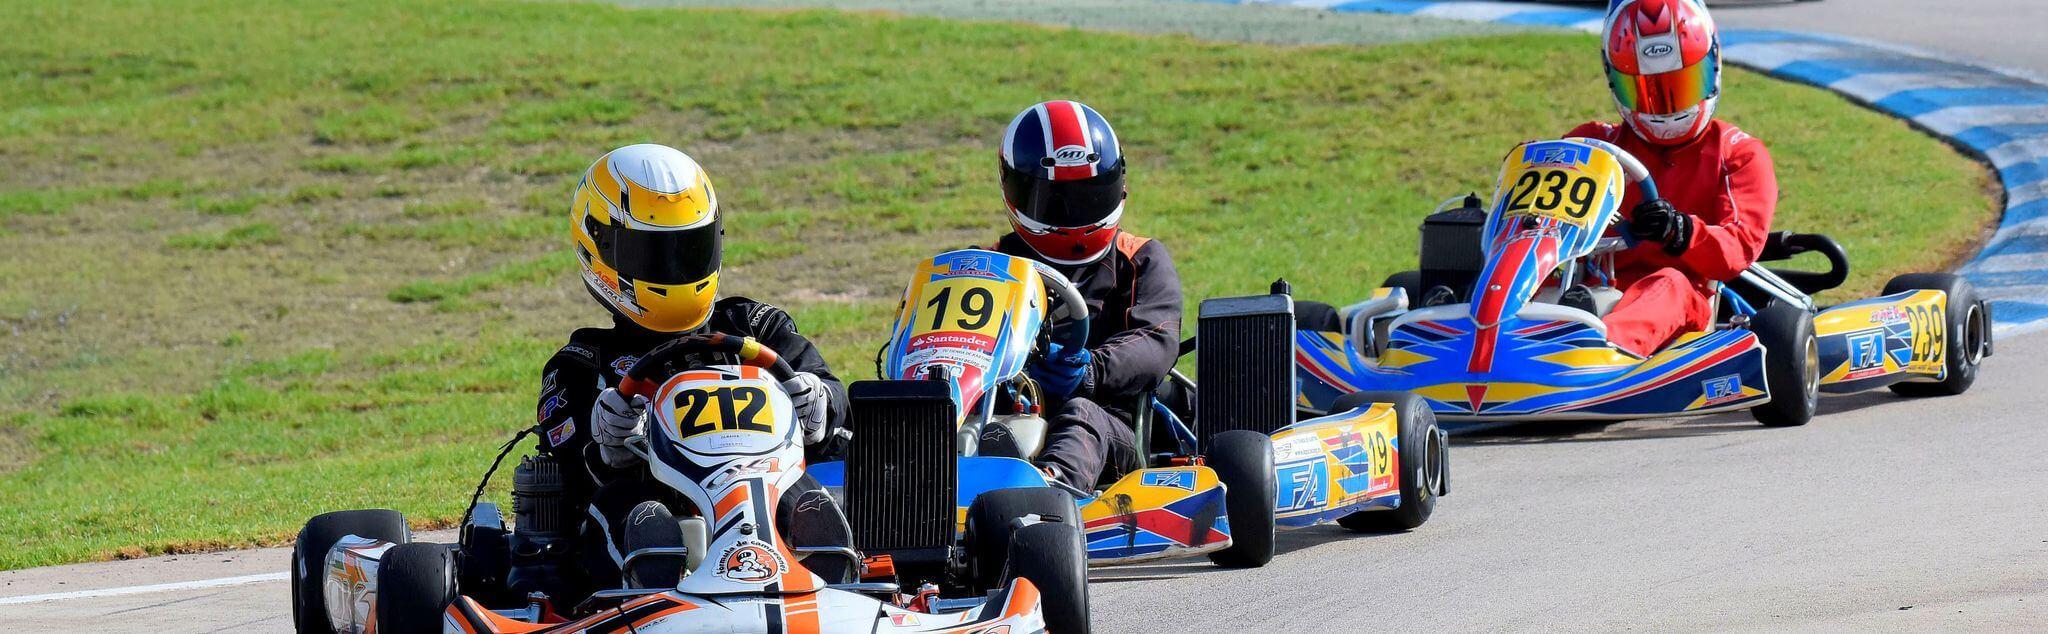 Karting dans Hautes-Alpes